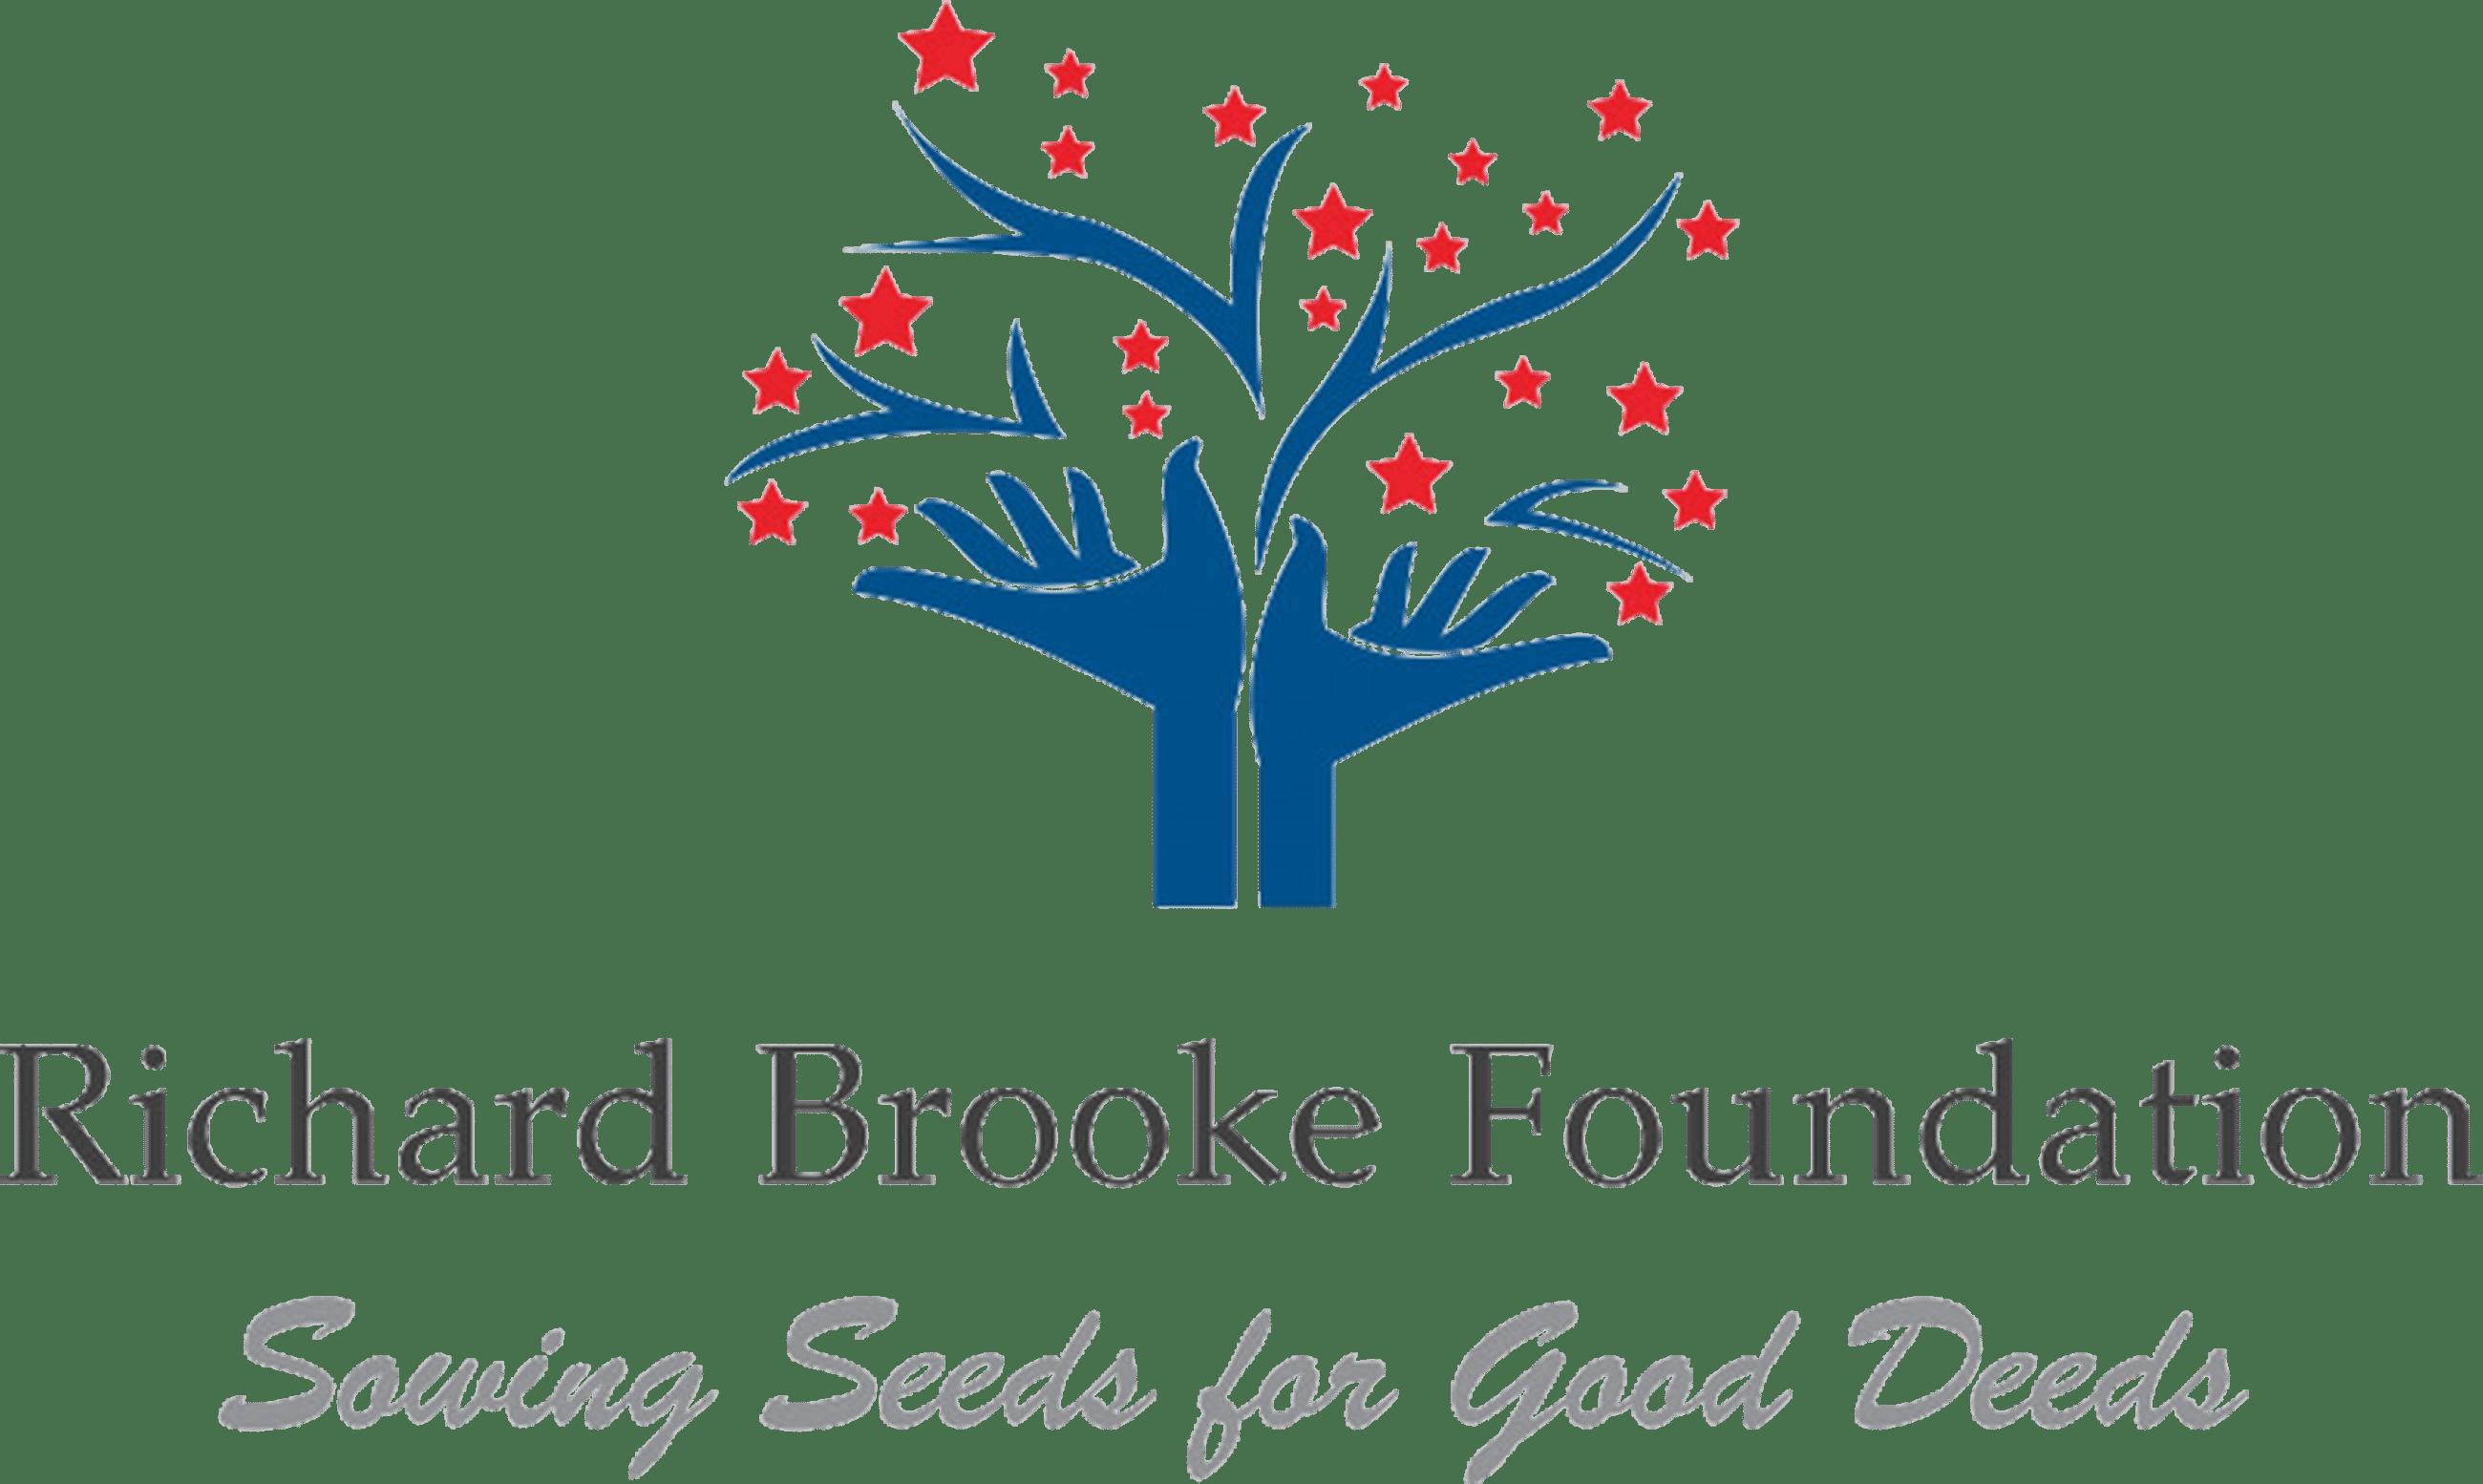 Richard Brooke Foundation